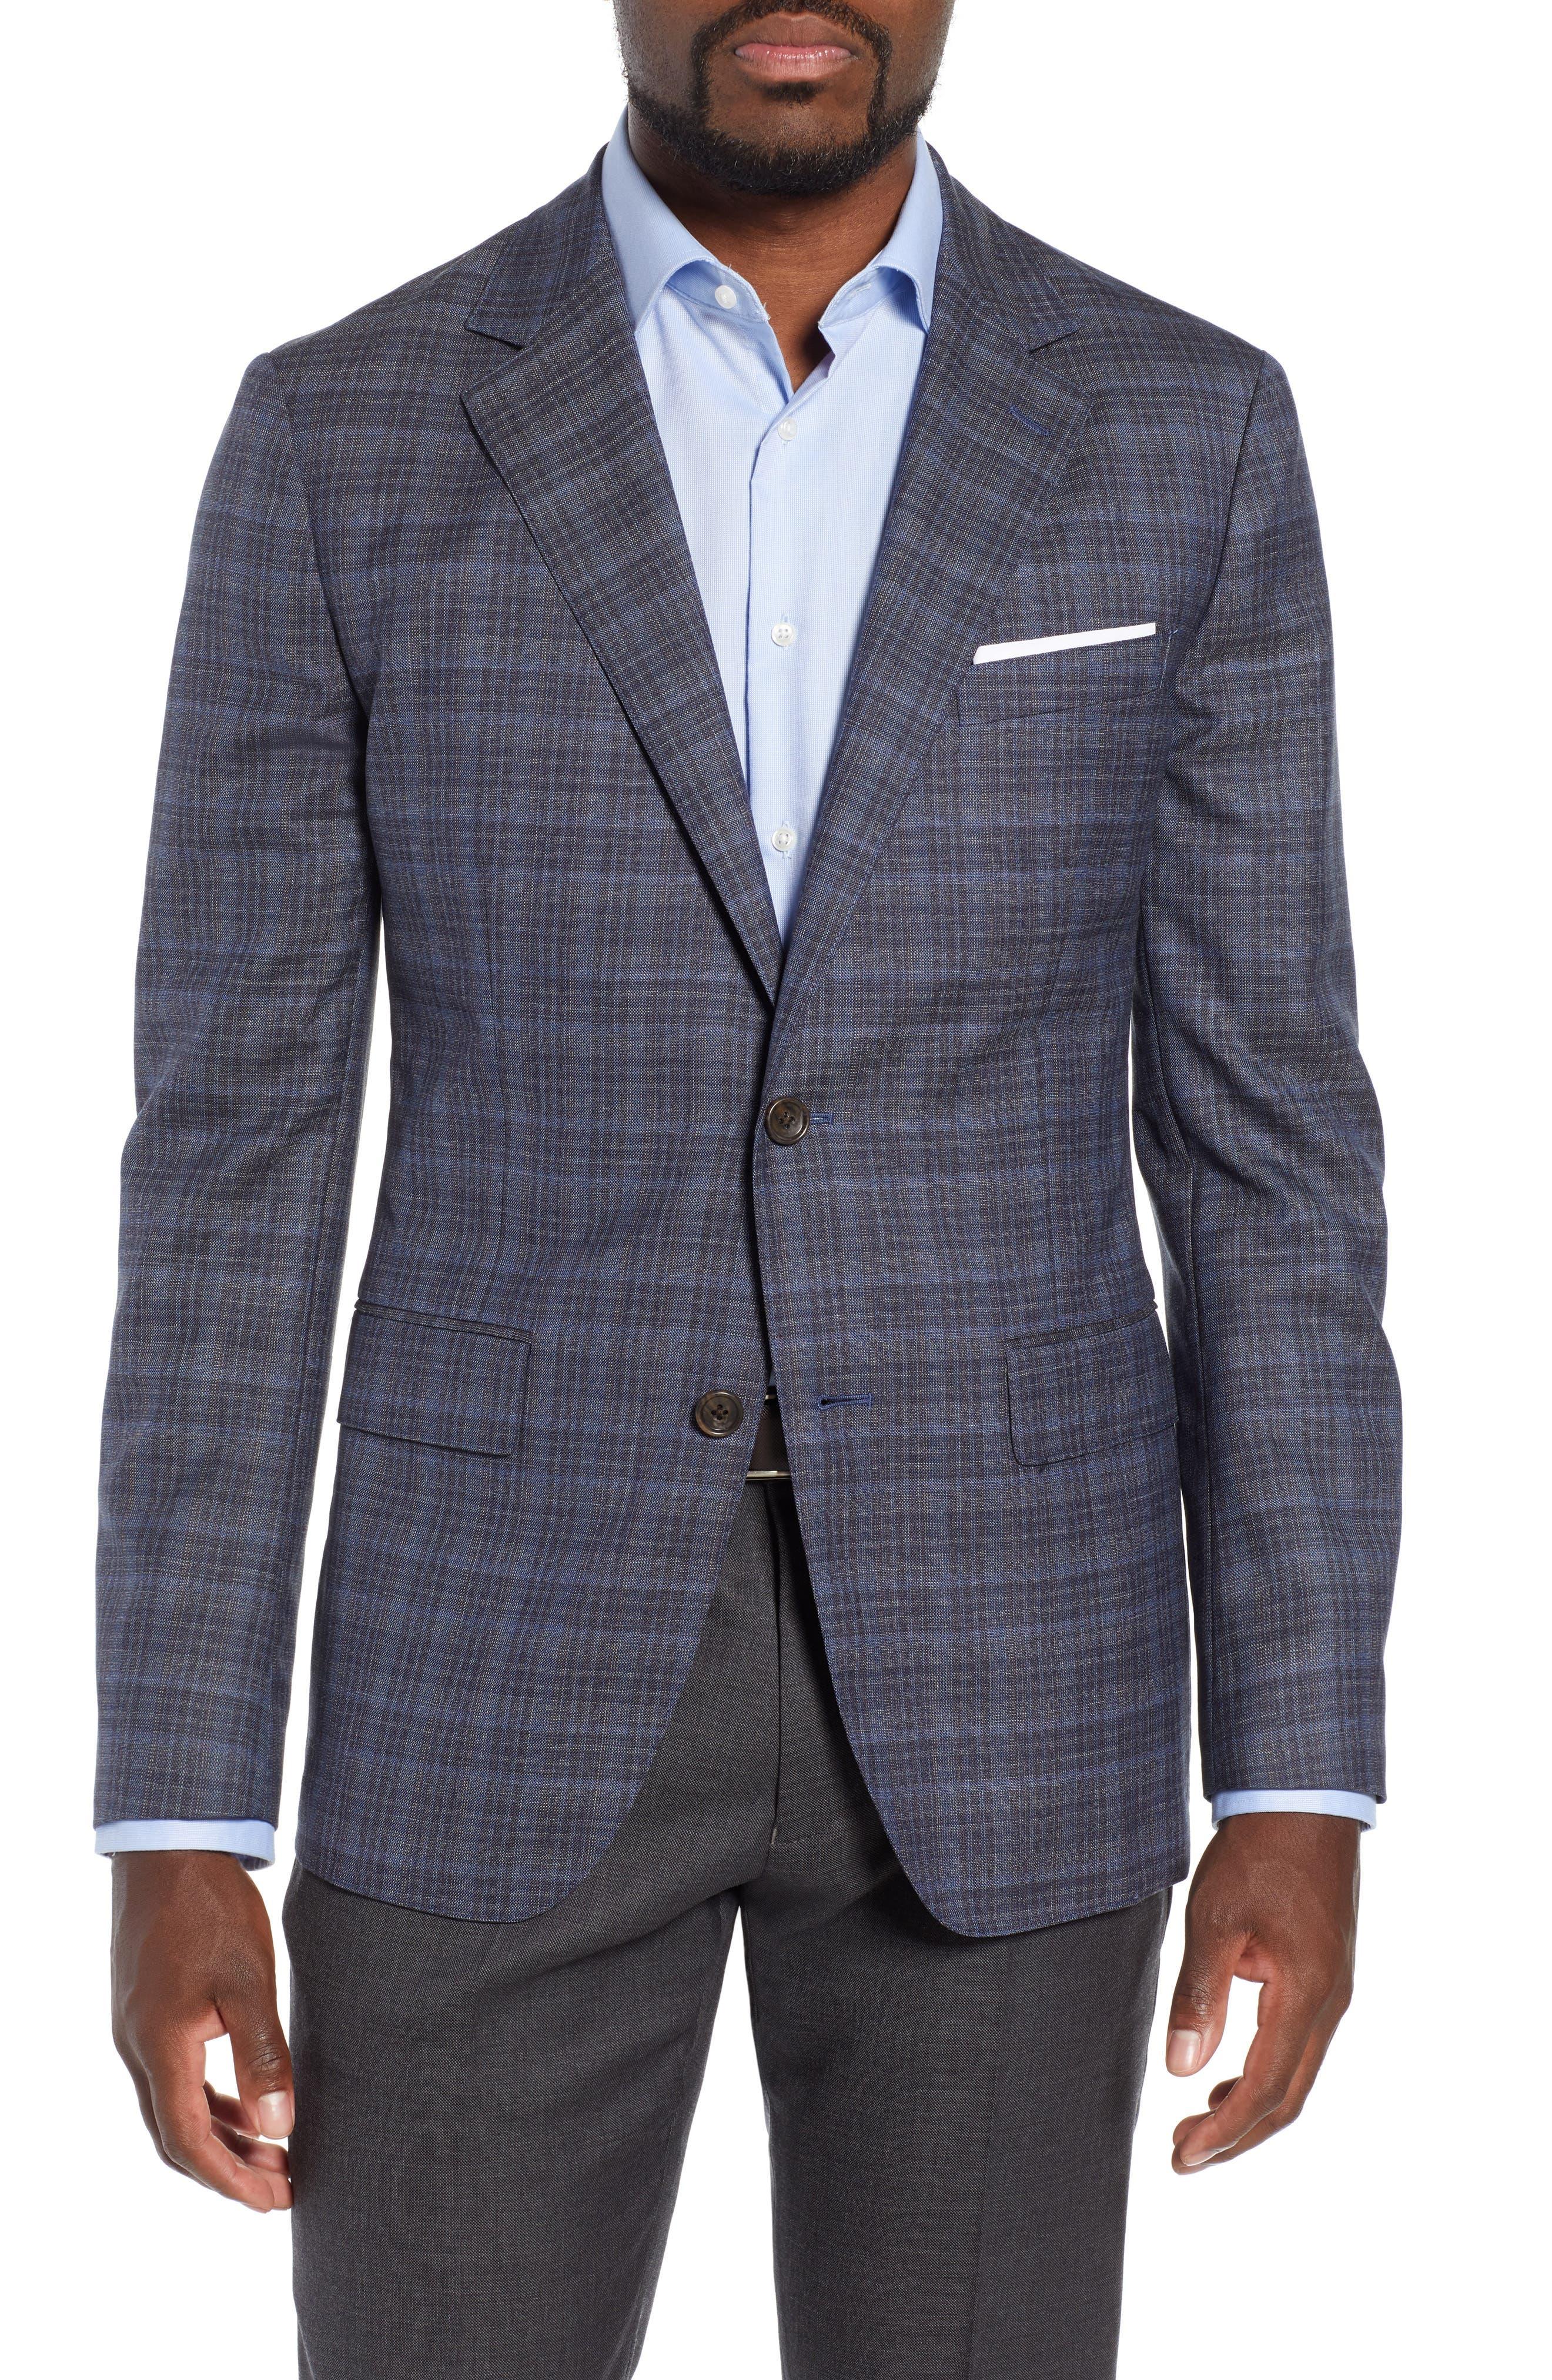 BONOBOS Slim Fit Unconstructed Plaid Sport Coat in Grey Plaid